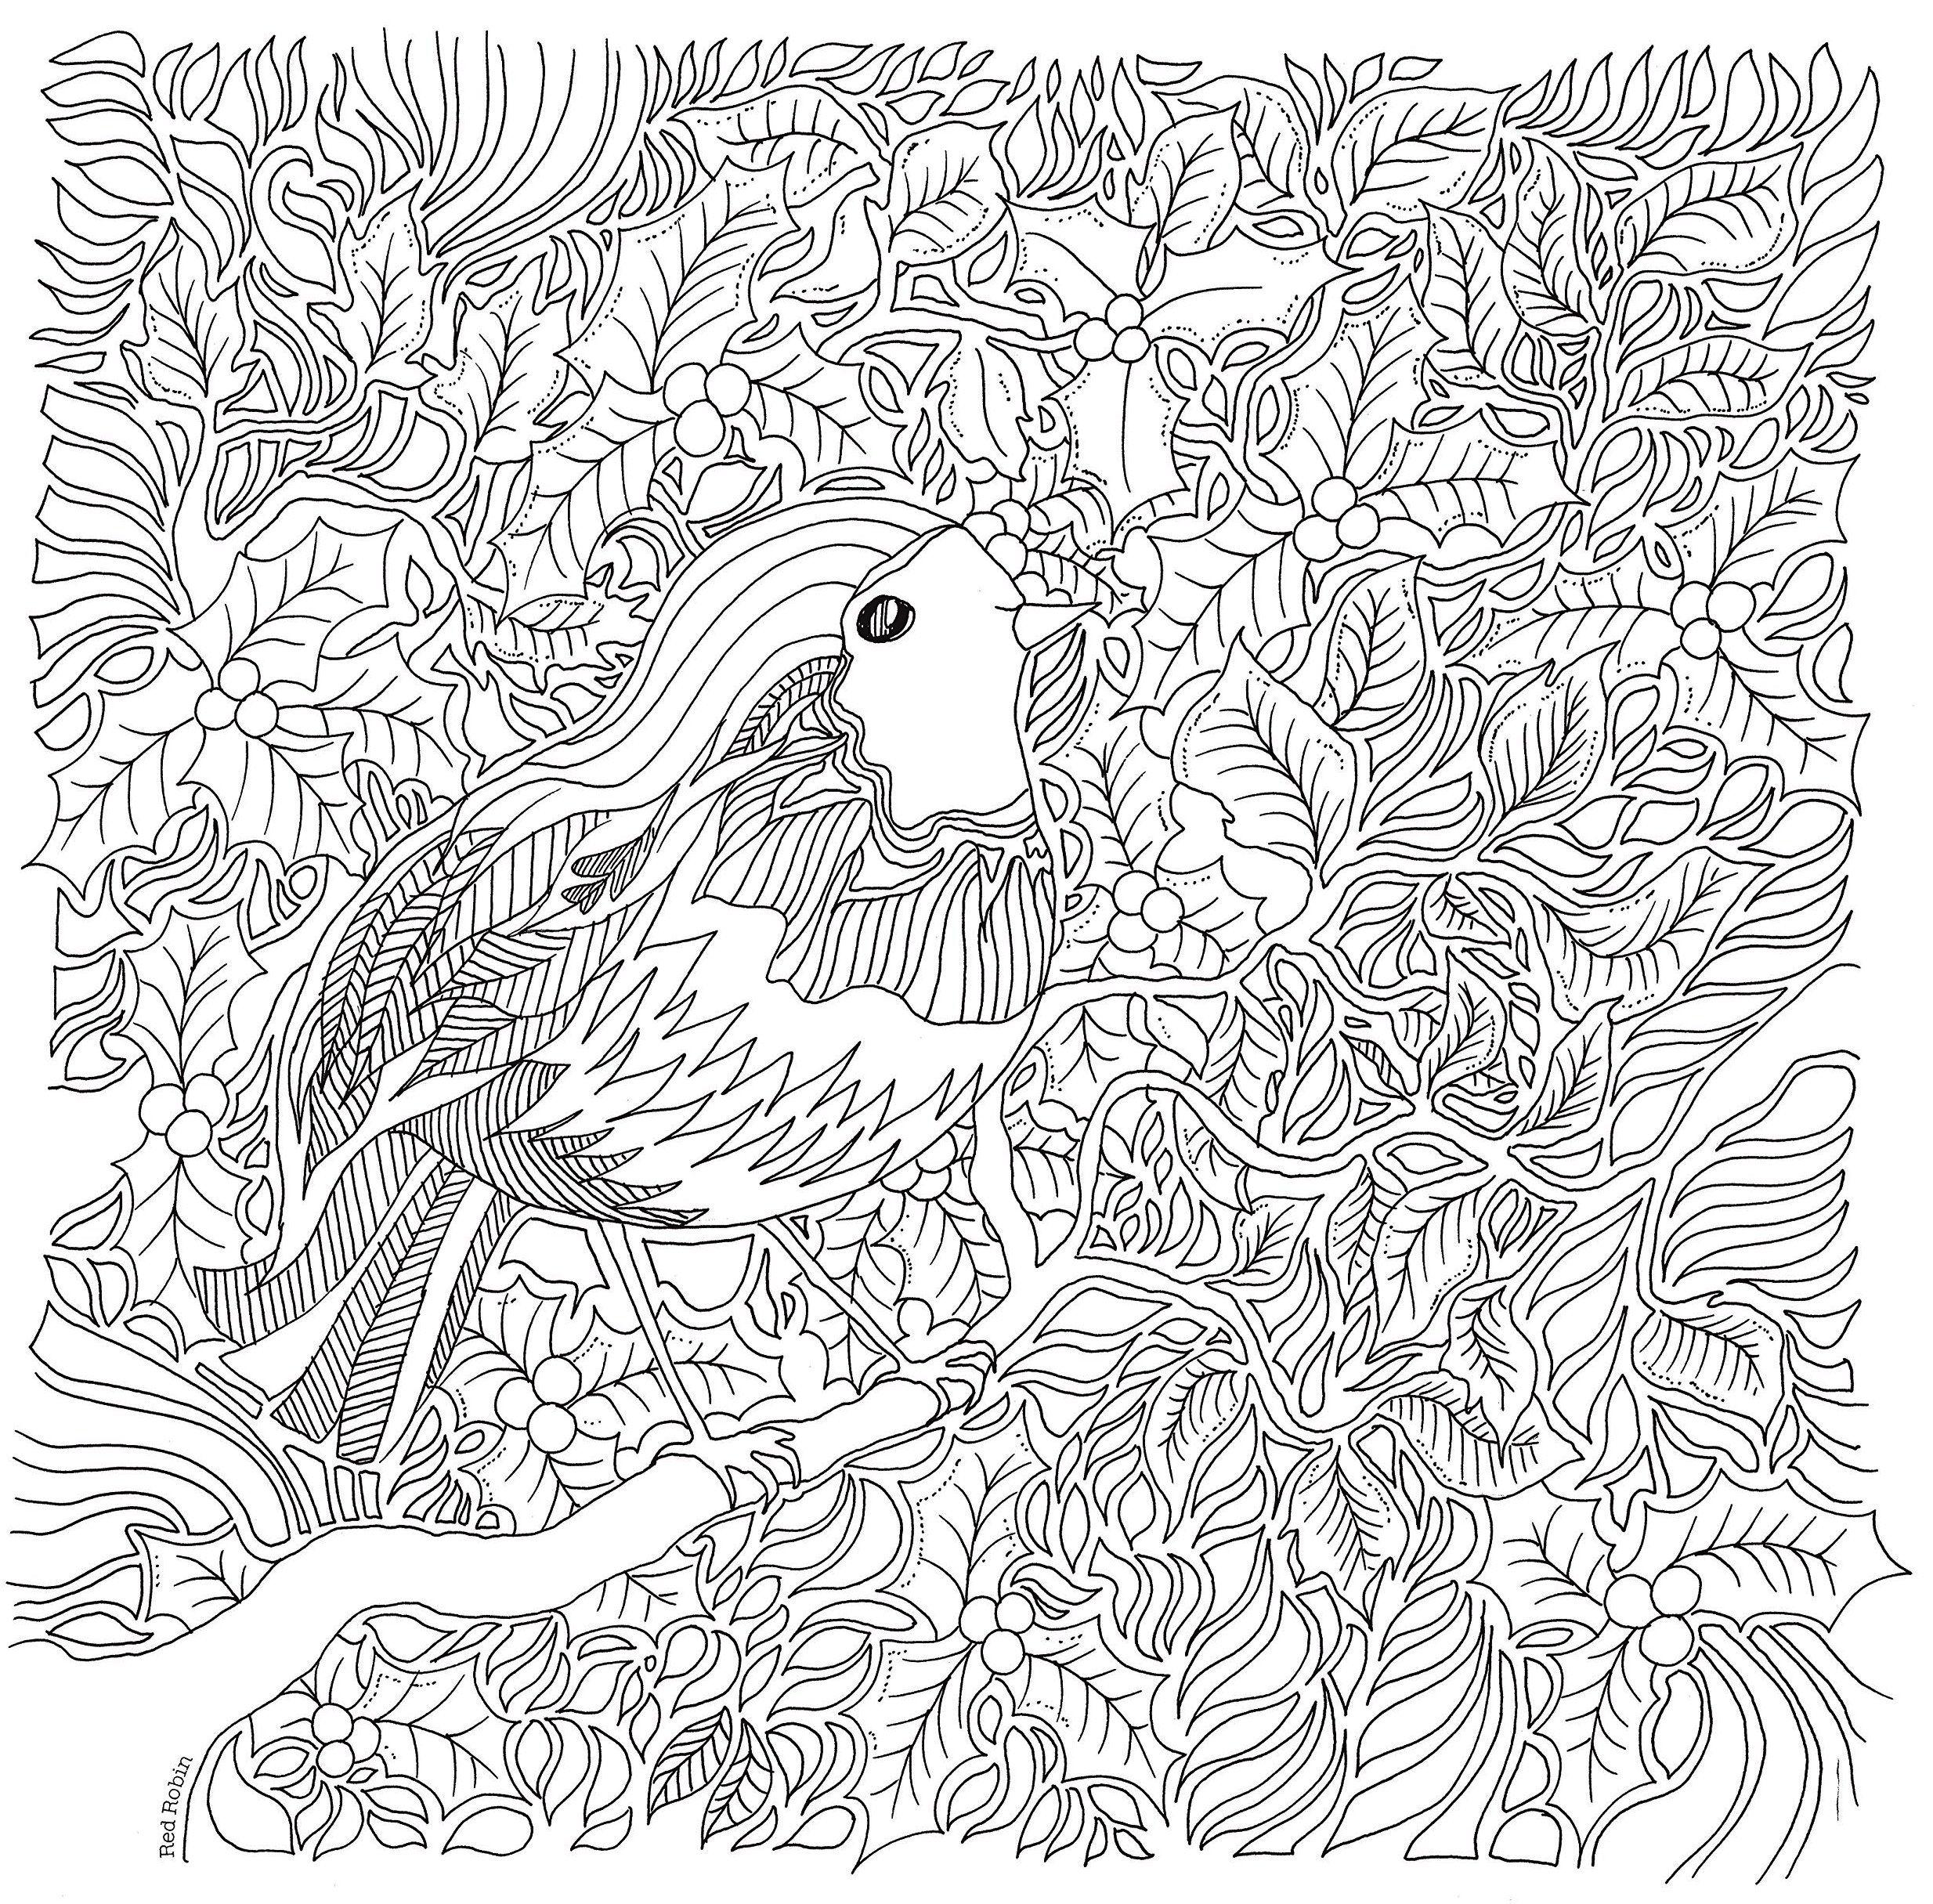 birdenchantedforestcoloringbook 2468×2431